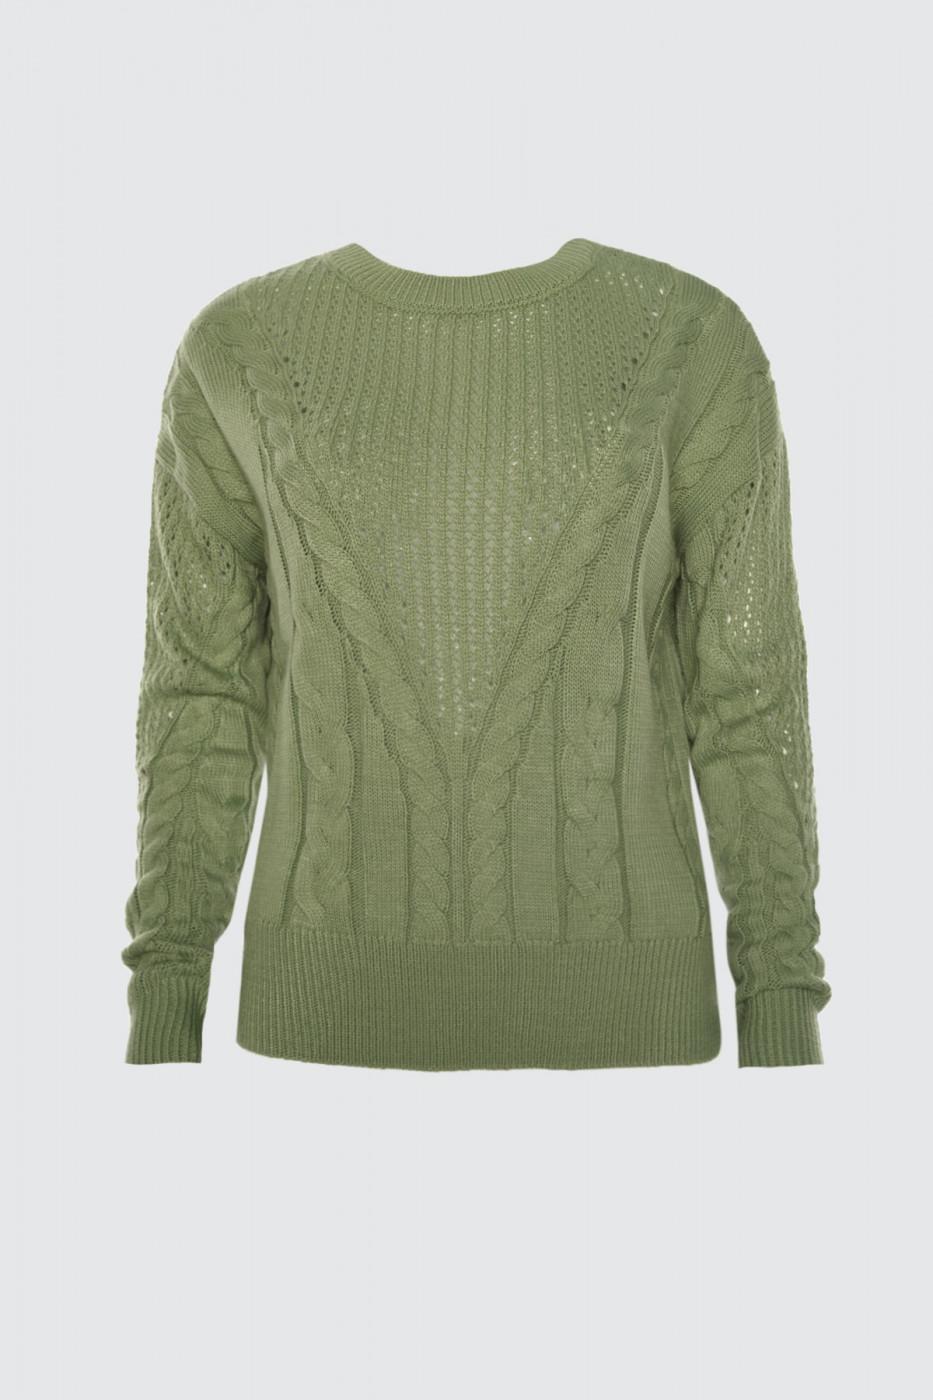 Trendyol Mint Blinds Knitted Detailed Knitwear Sweater